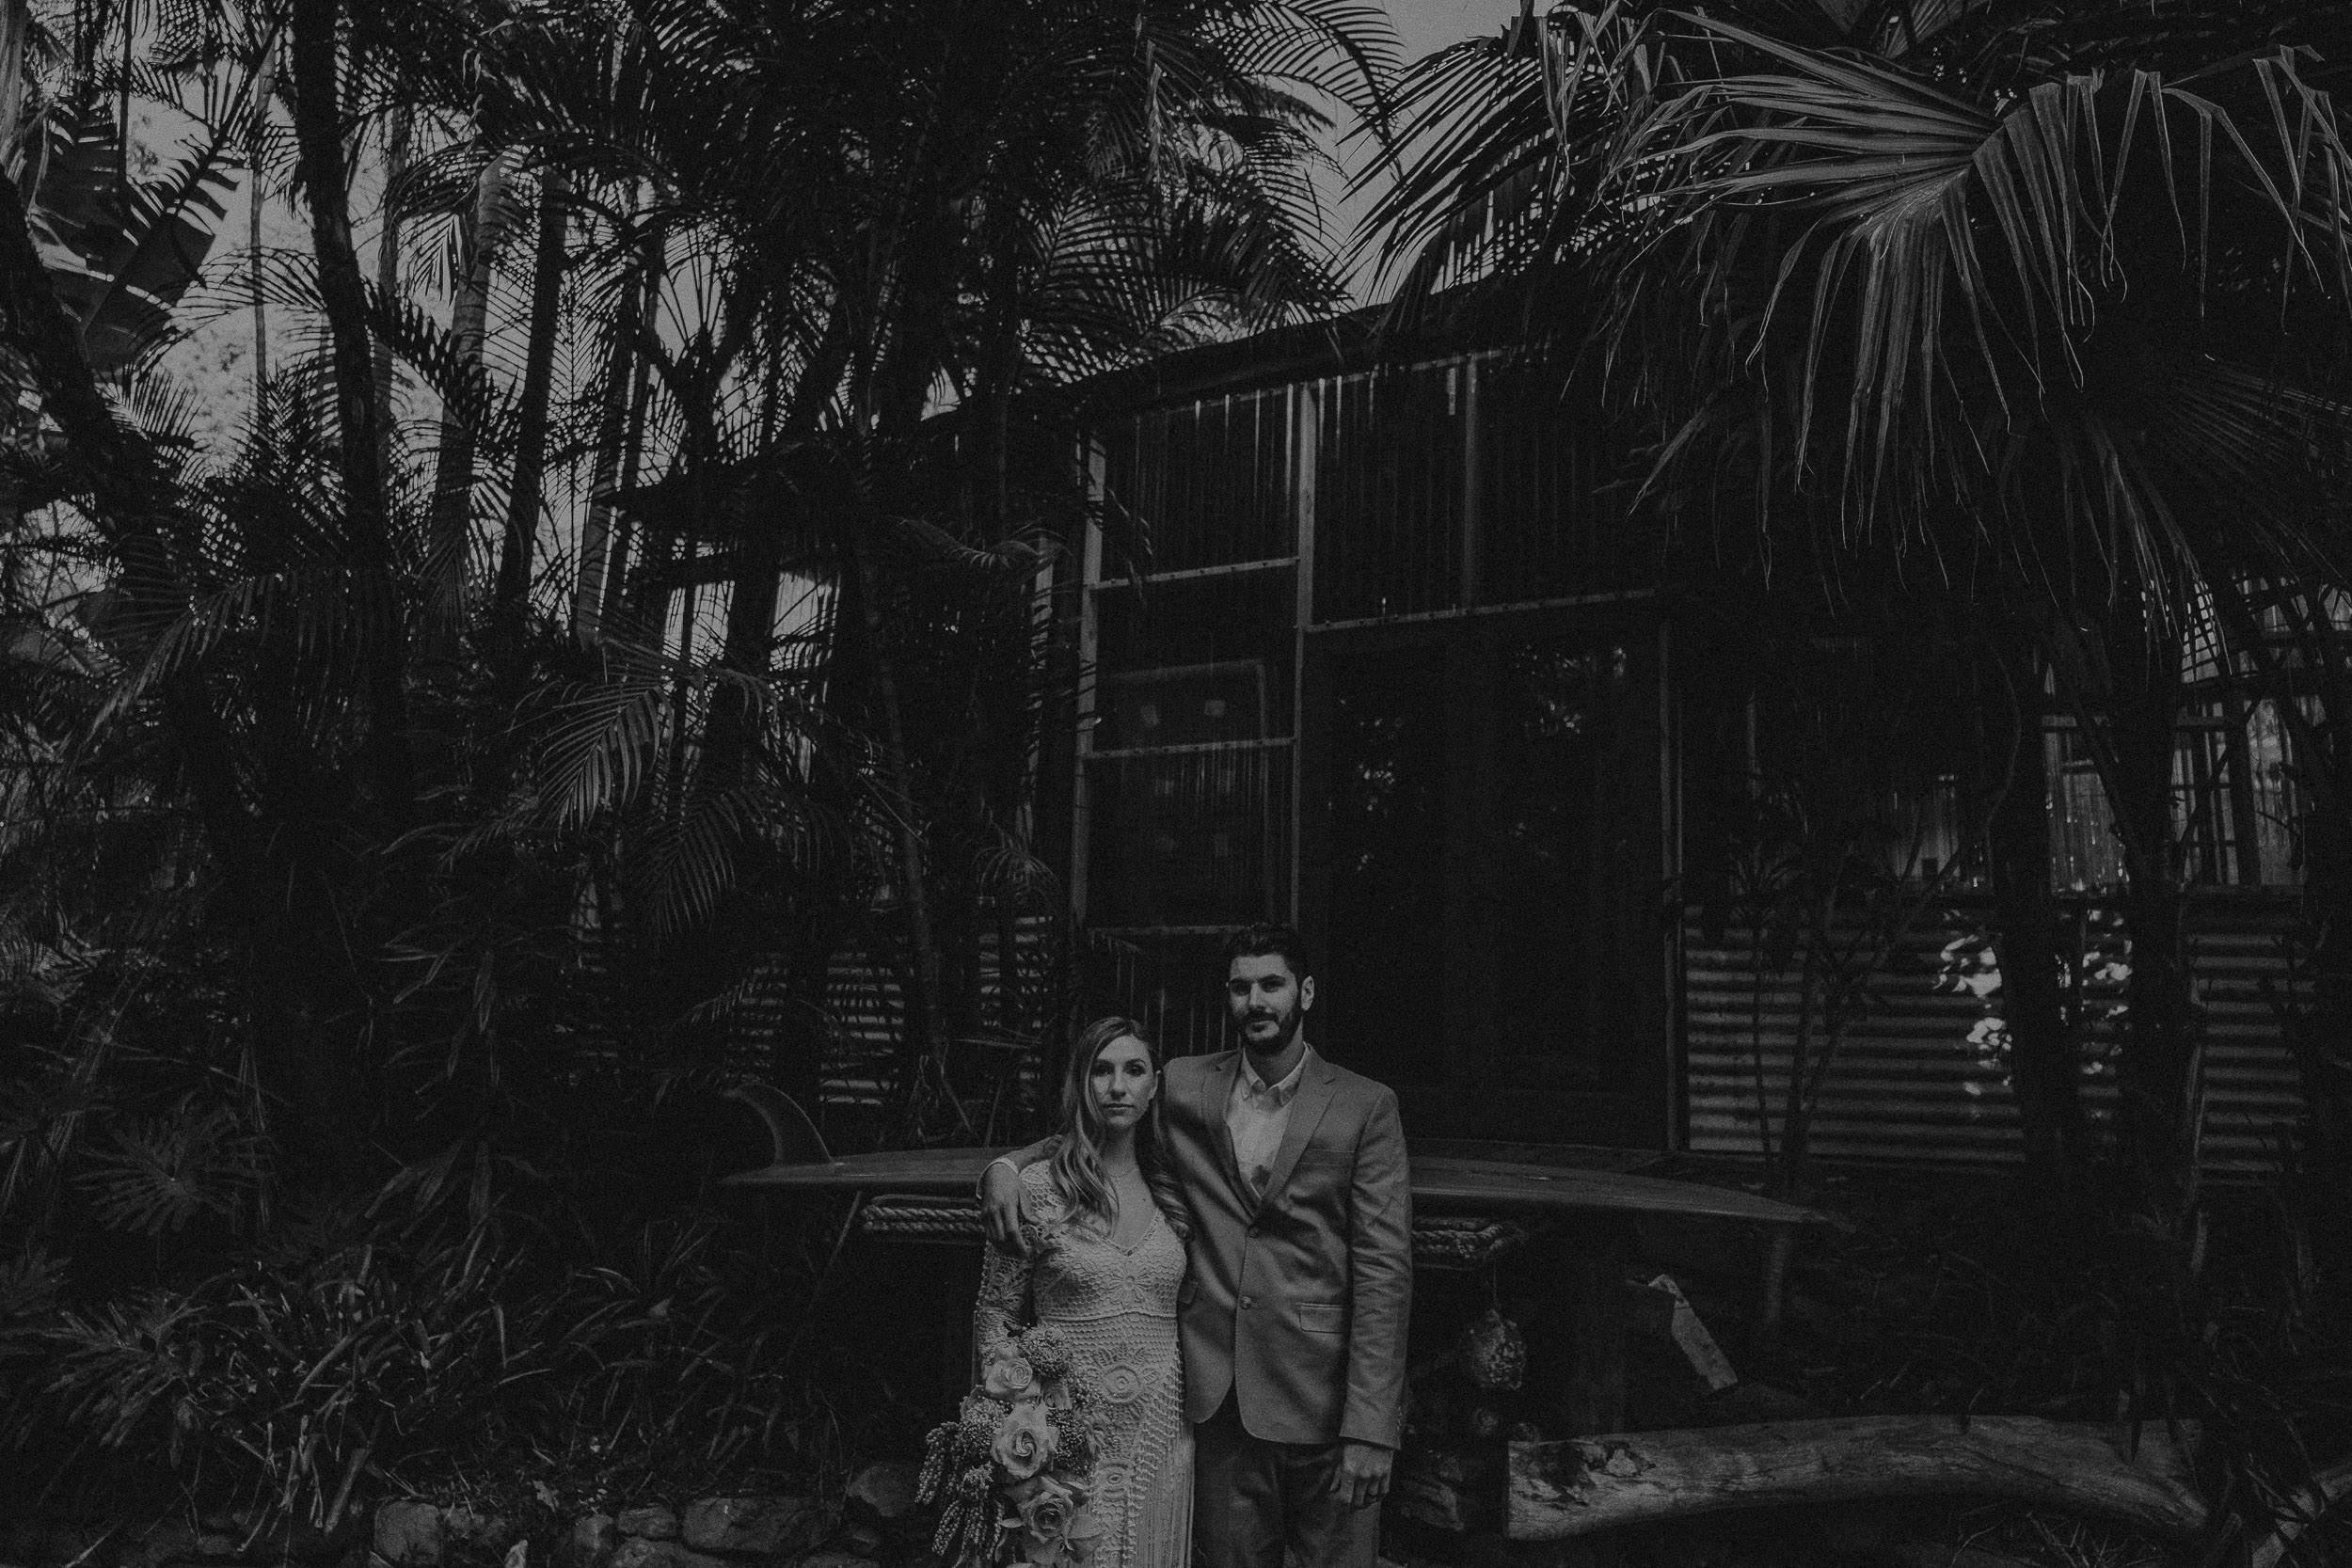 S&A Elopement - Kings & Thieves - Shred 'Til Dead - Central Coast Beach Forest Wedding - 319.jpg